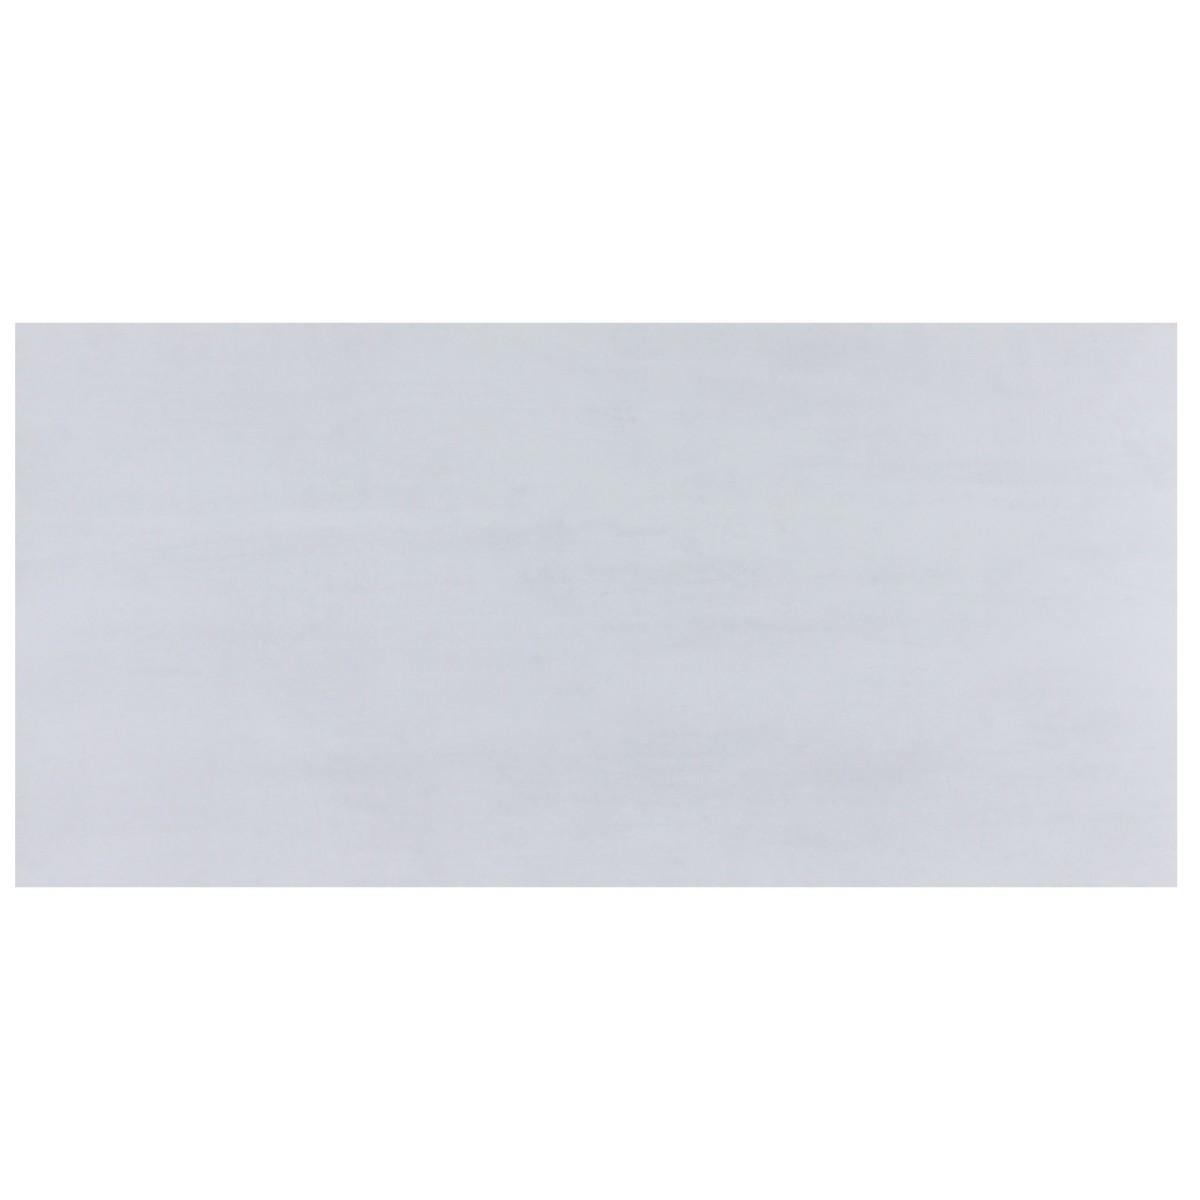 Плитка настенная Новус 30х60 см 1.62 м² цвет белый